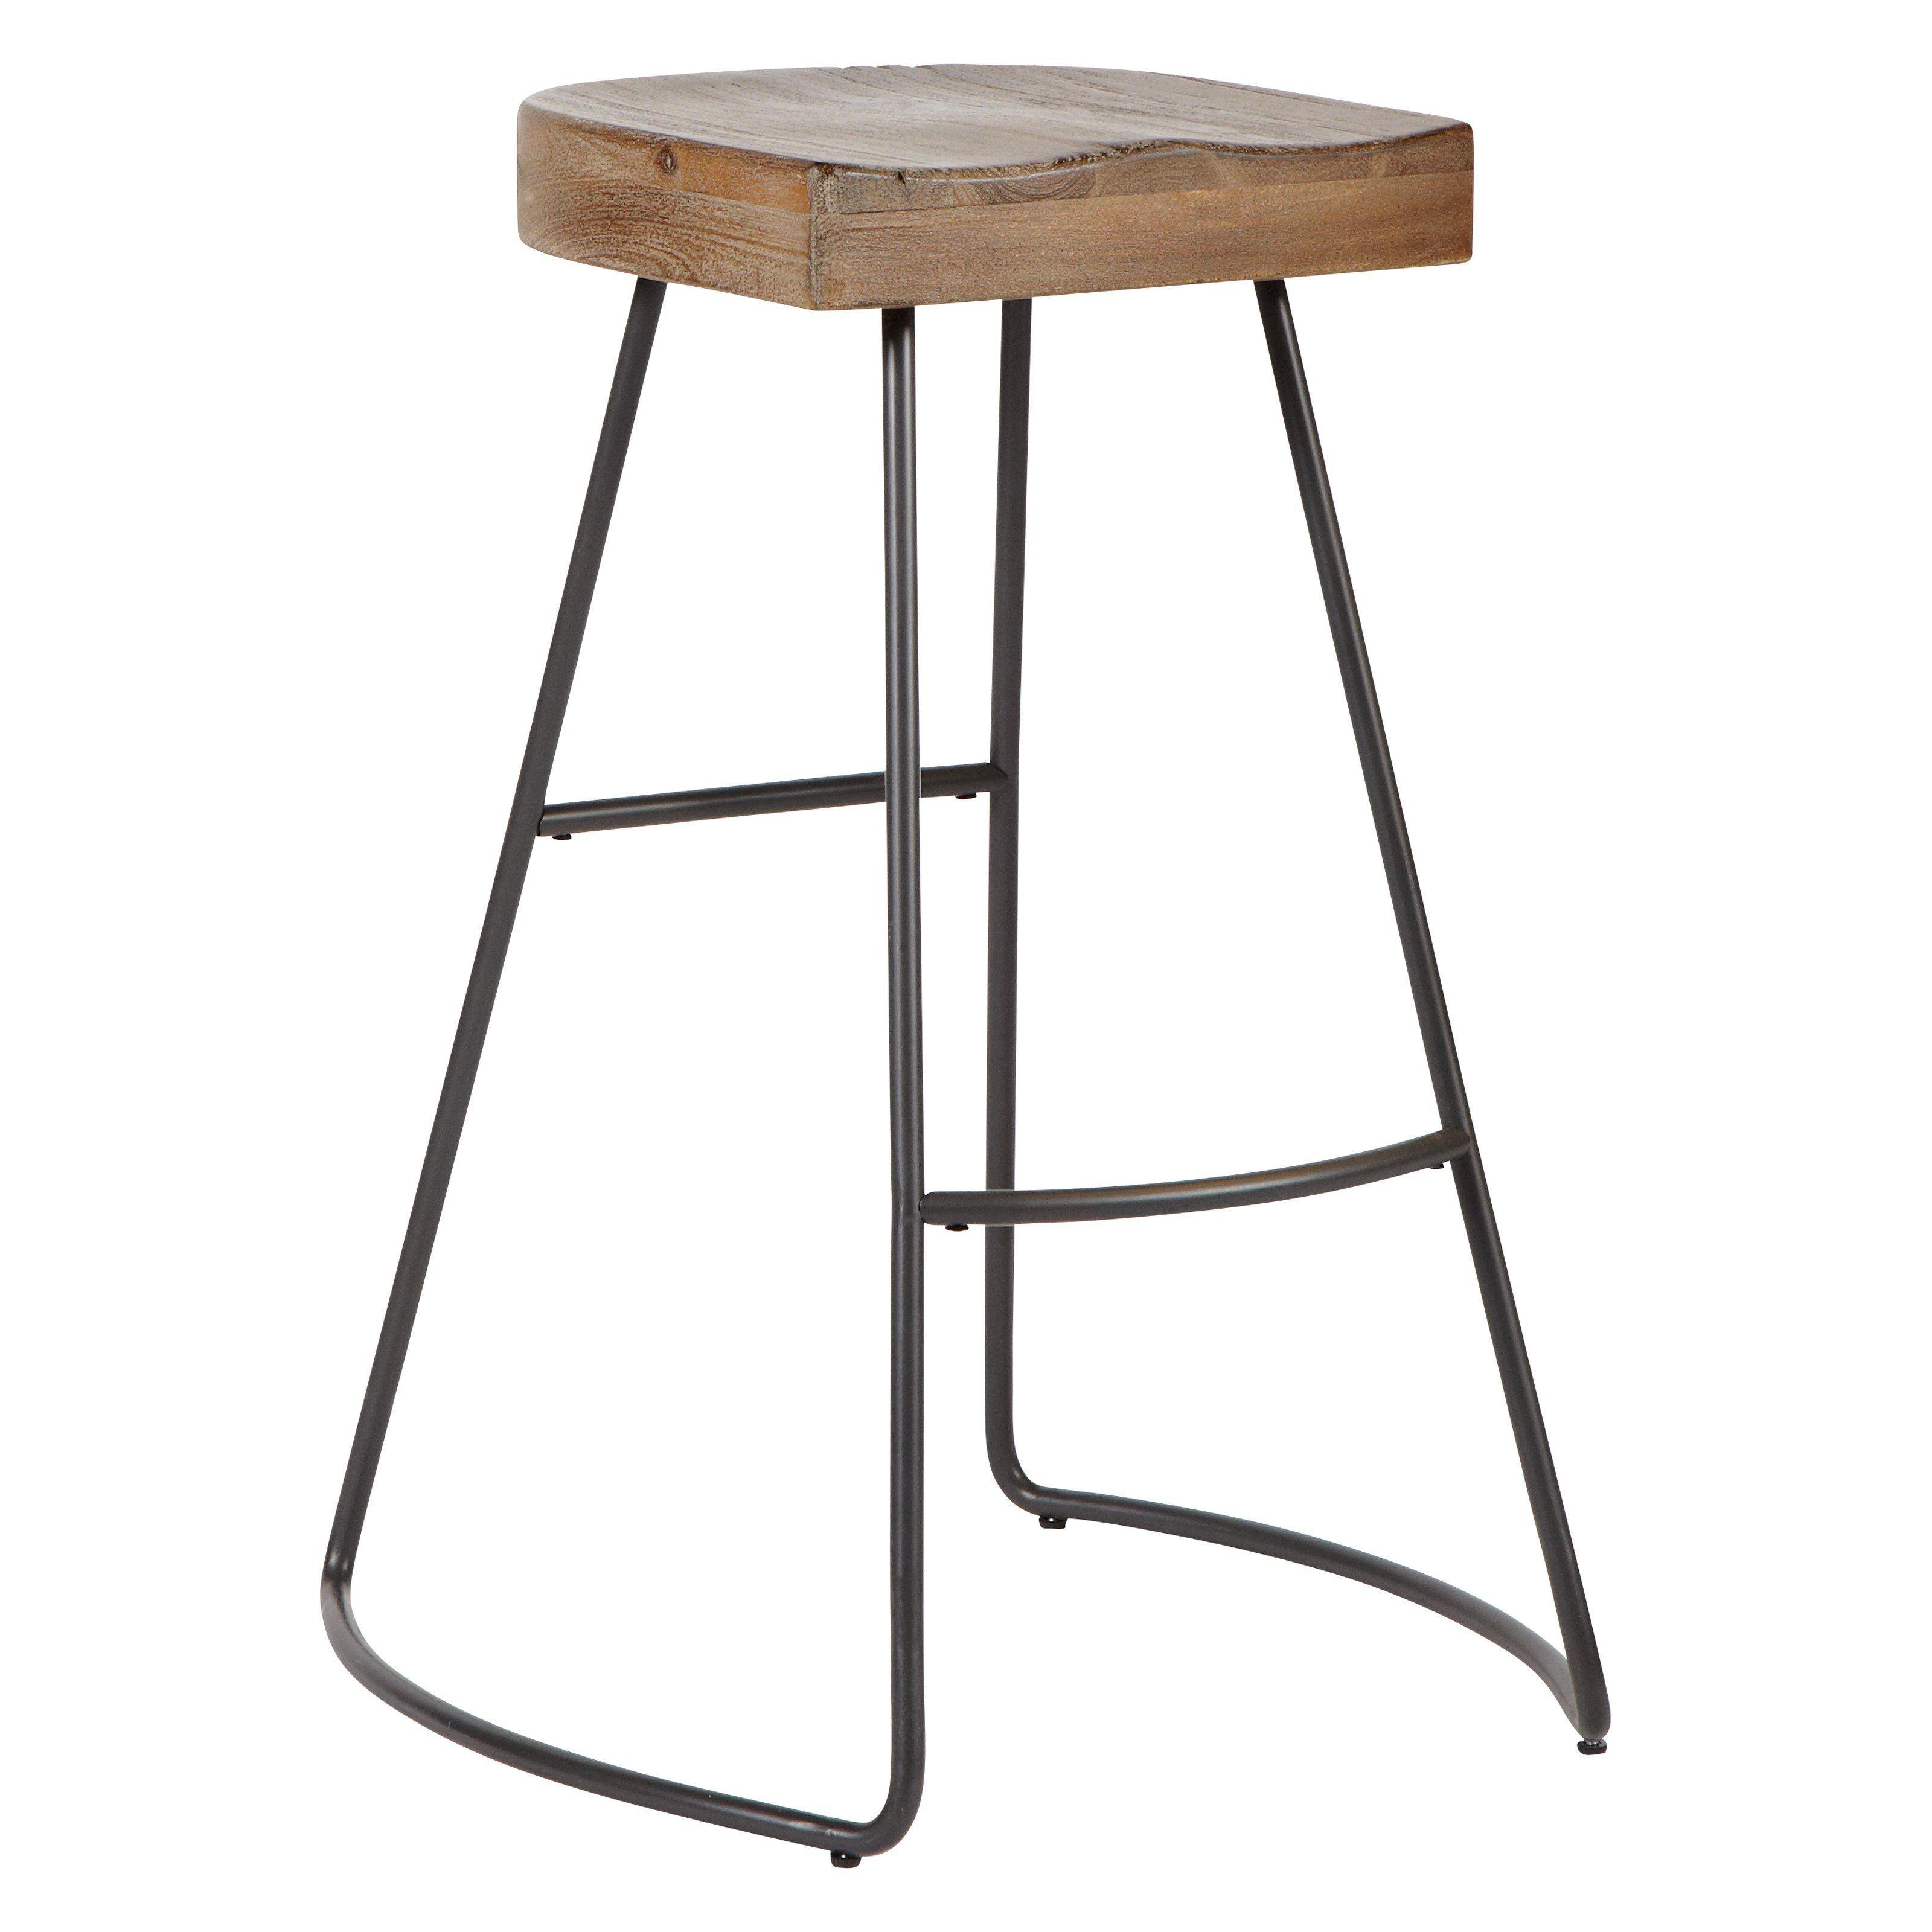 Avalon Furniture Saddle Seat Barstool